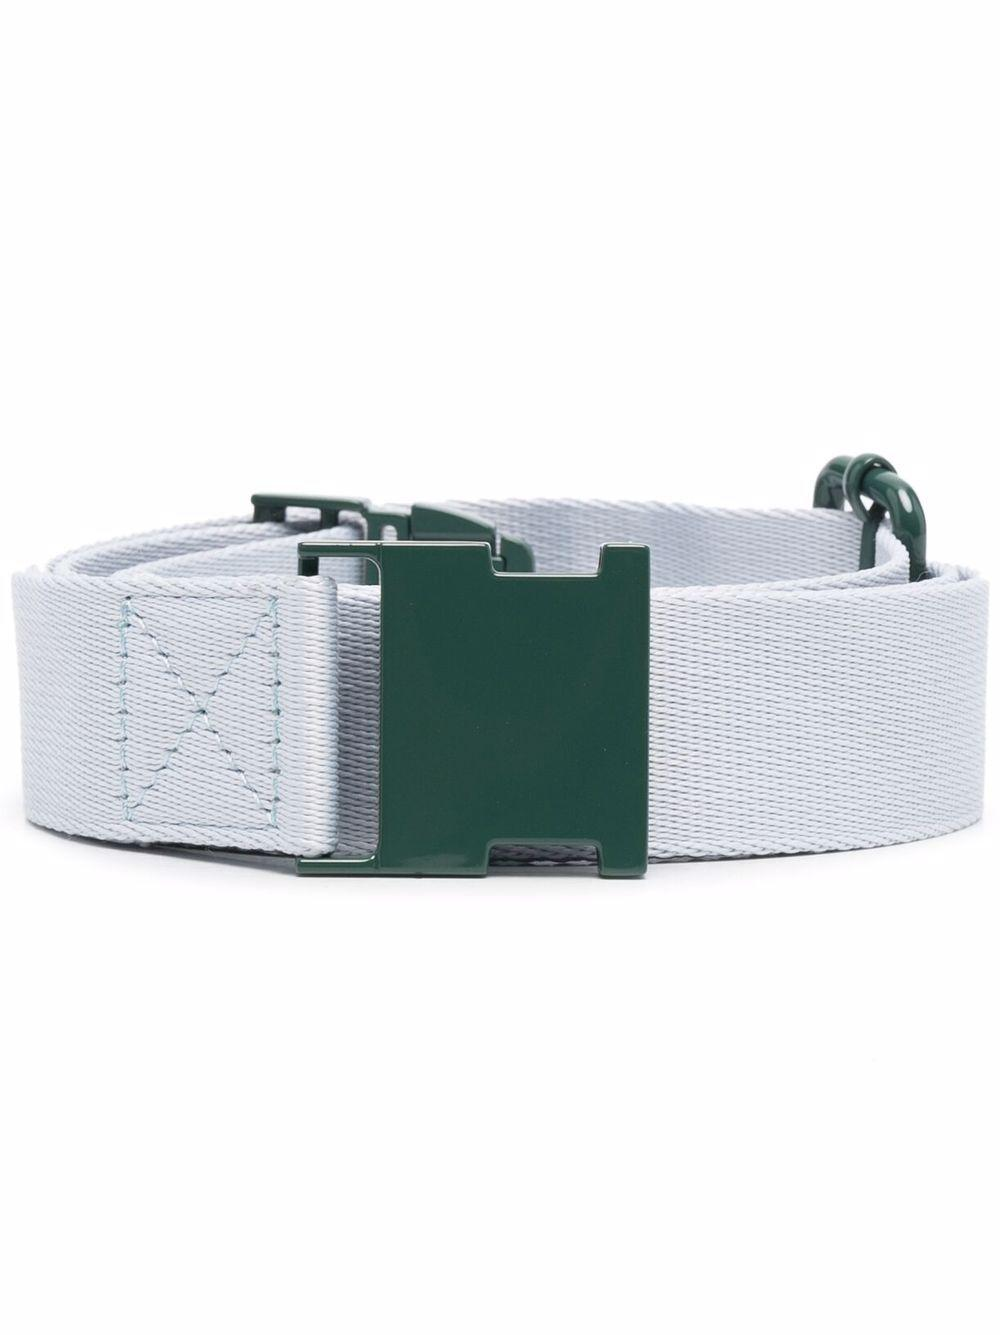 Recycled Tech Belt Item # A3655